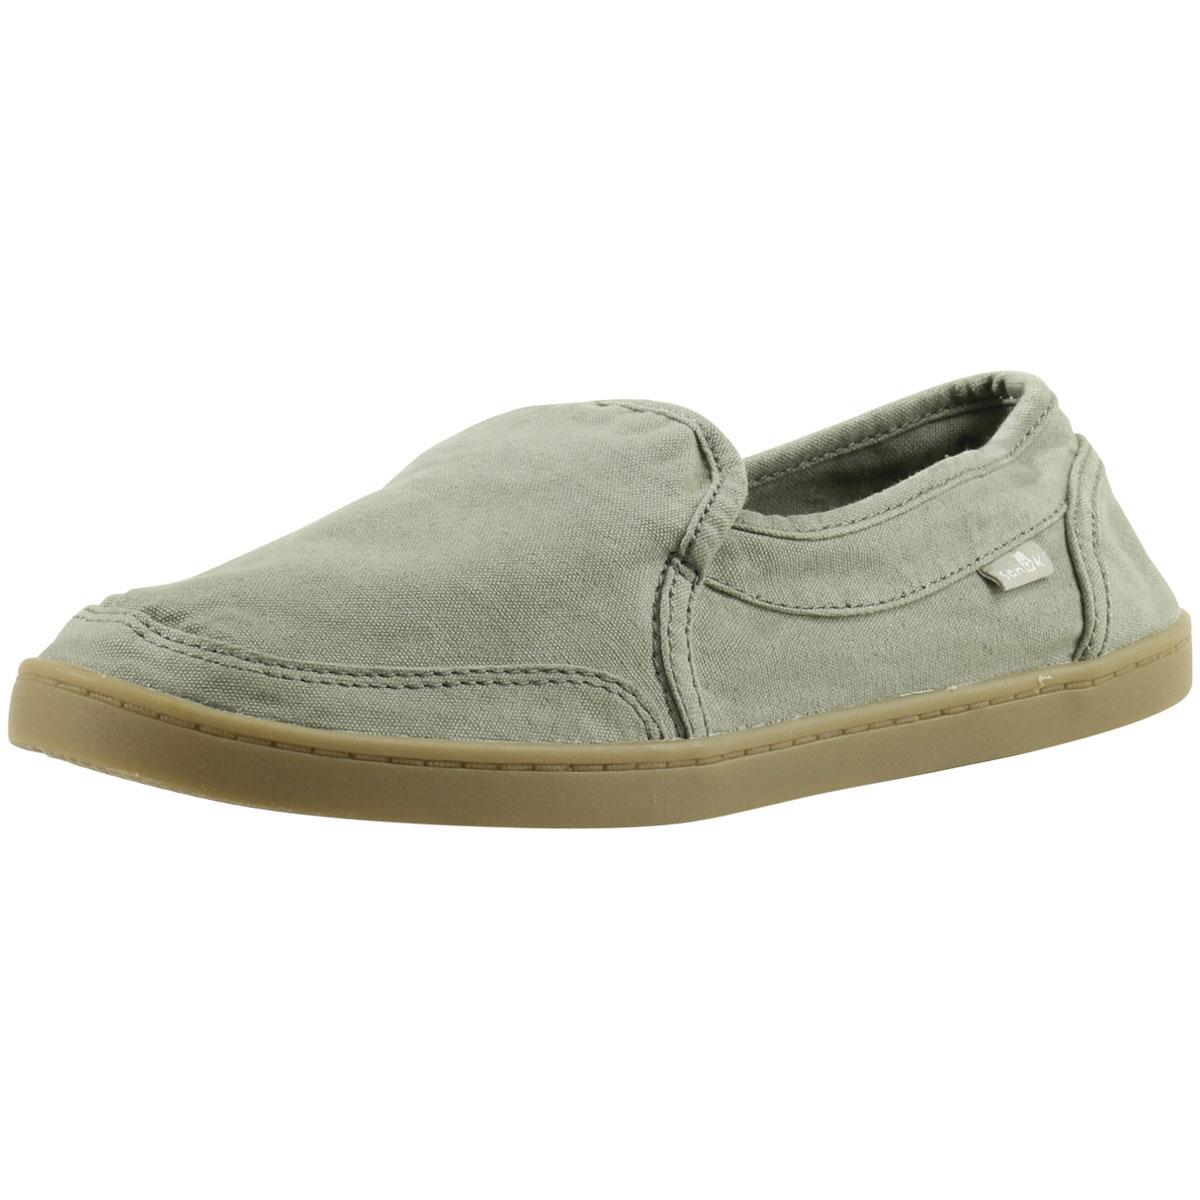 25c8c2b0417e3 Sanuk Women s Pair O Dice Canvas Loafers Shoes